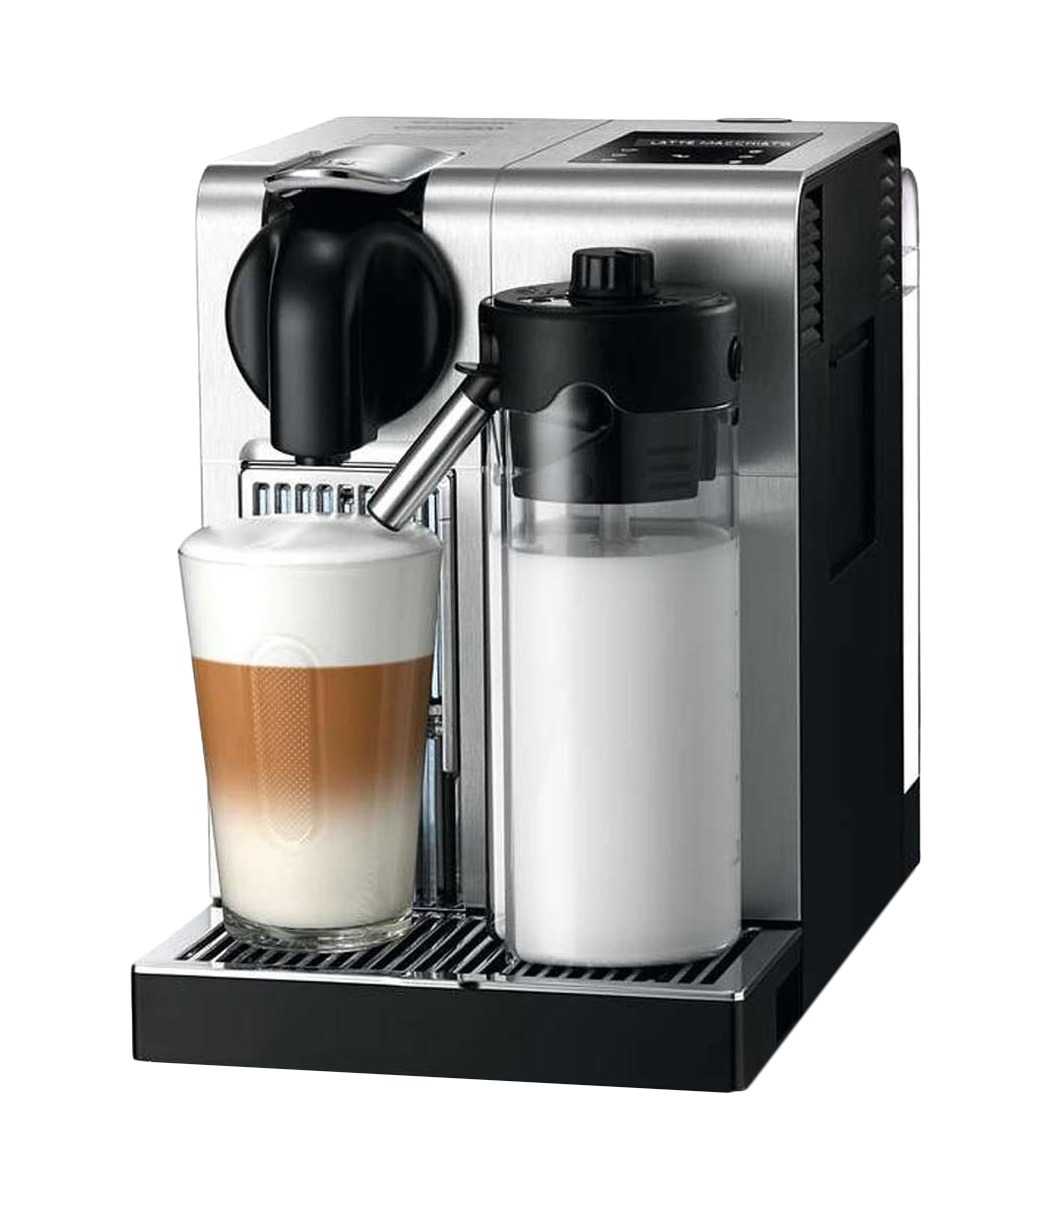 DeLonghi EN7520MB Lattissima Pro Nespresso-apparaat RVS